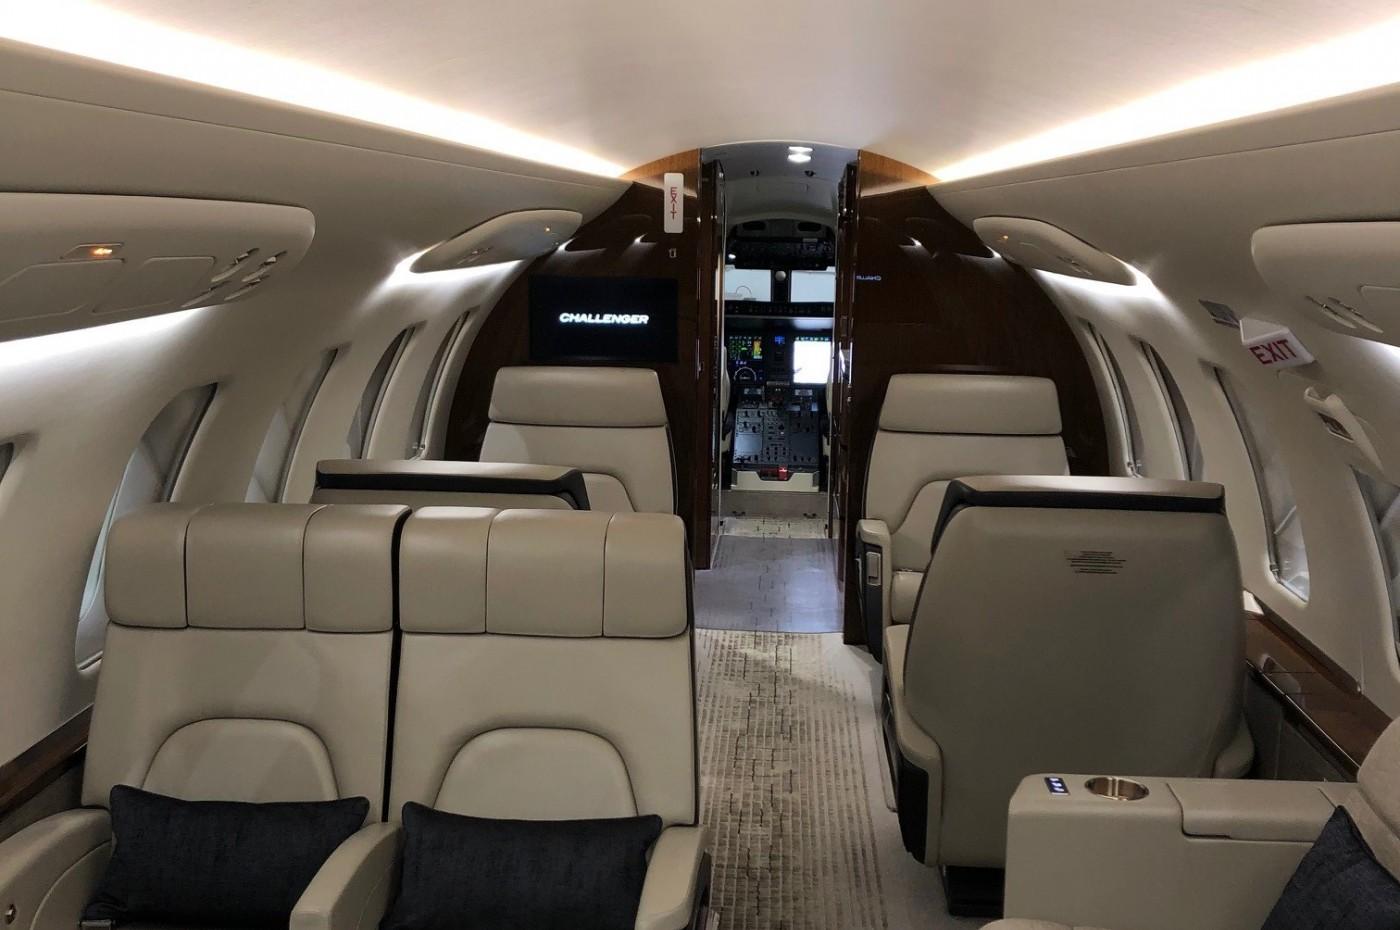 Cabin Challenger 650 S/N 6154